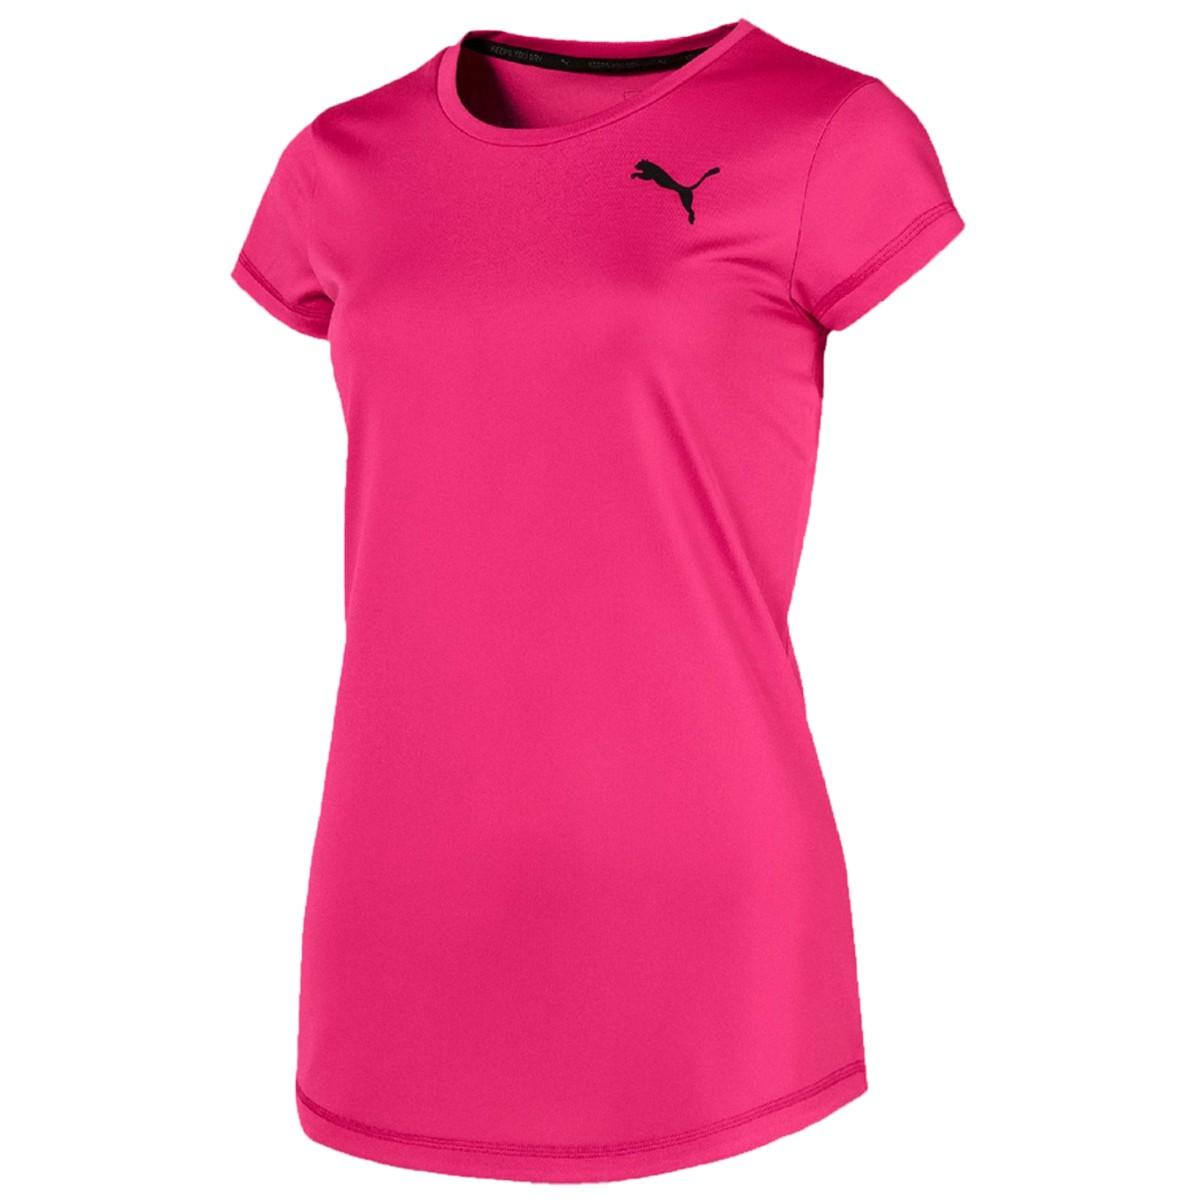 Camiseta Puma Active Tee - Feminina - Pink